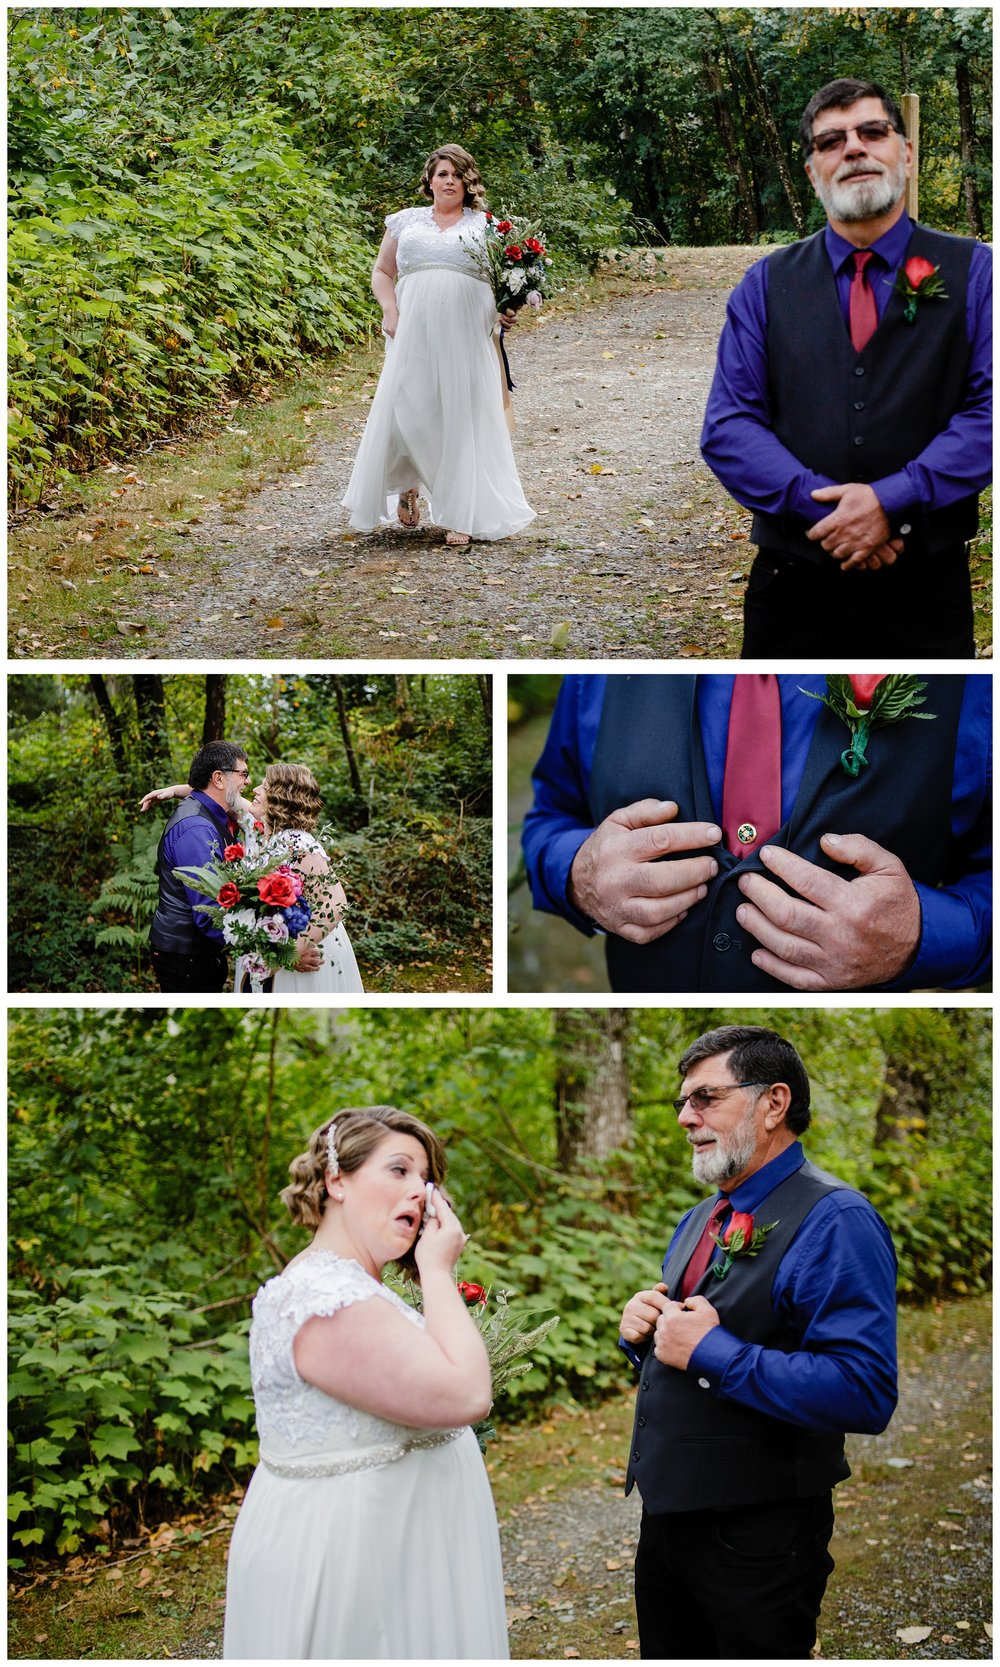 Aldergrove Park Fall Backyard Wedding Photographer Pregnant Bride Tent Outdoor BC Canada Best Wedding Photographer_0013.jpg